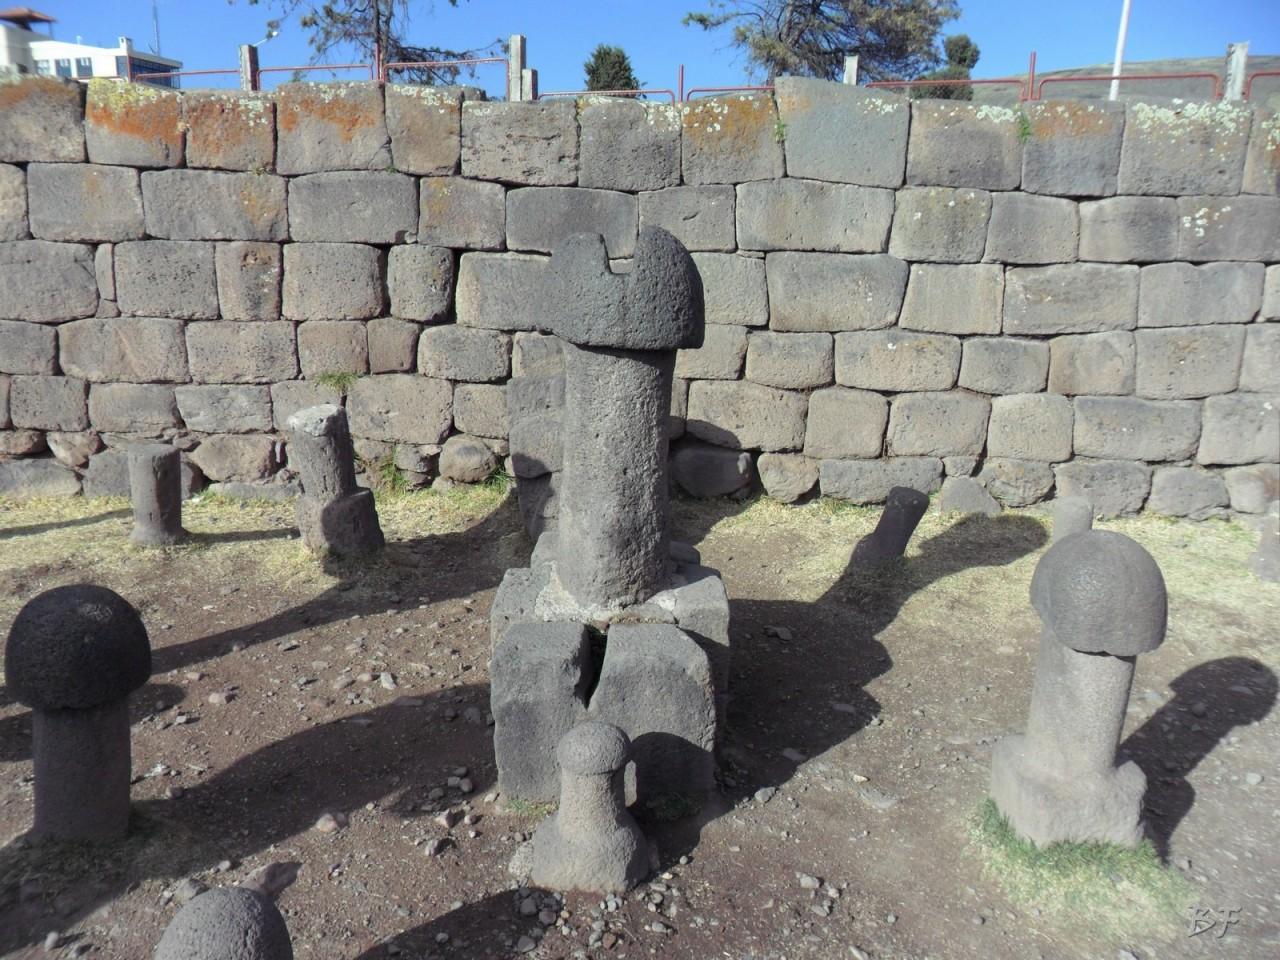 Mura-Poligonali-Megaliti-Inca-Uyo-Puno-Perù-17